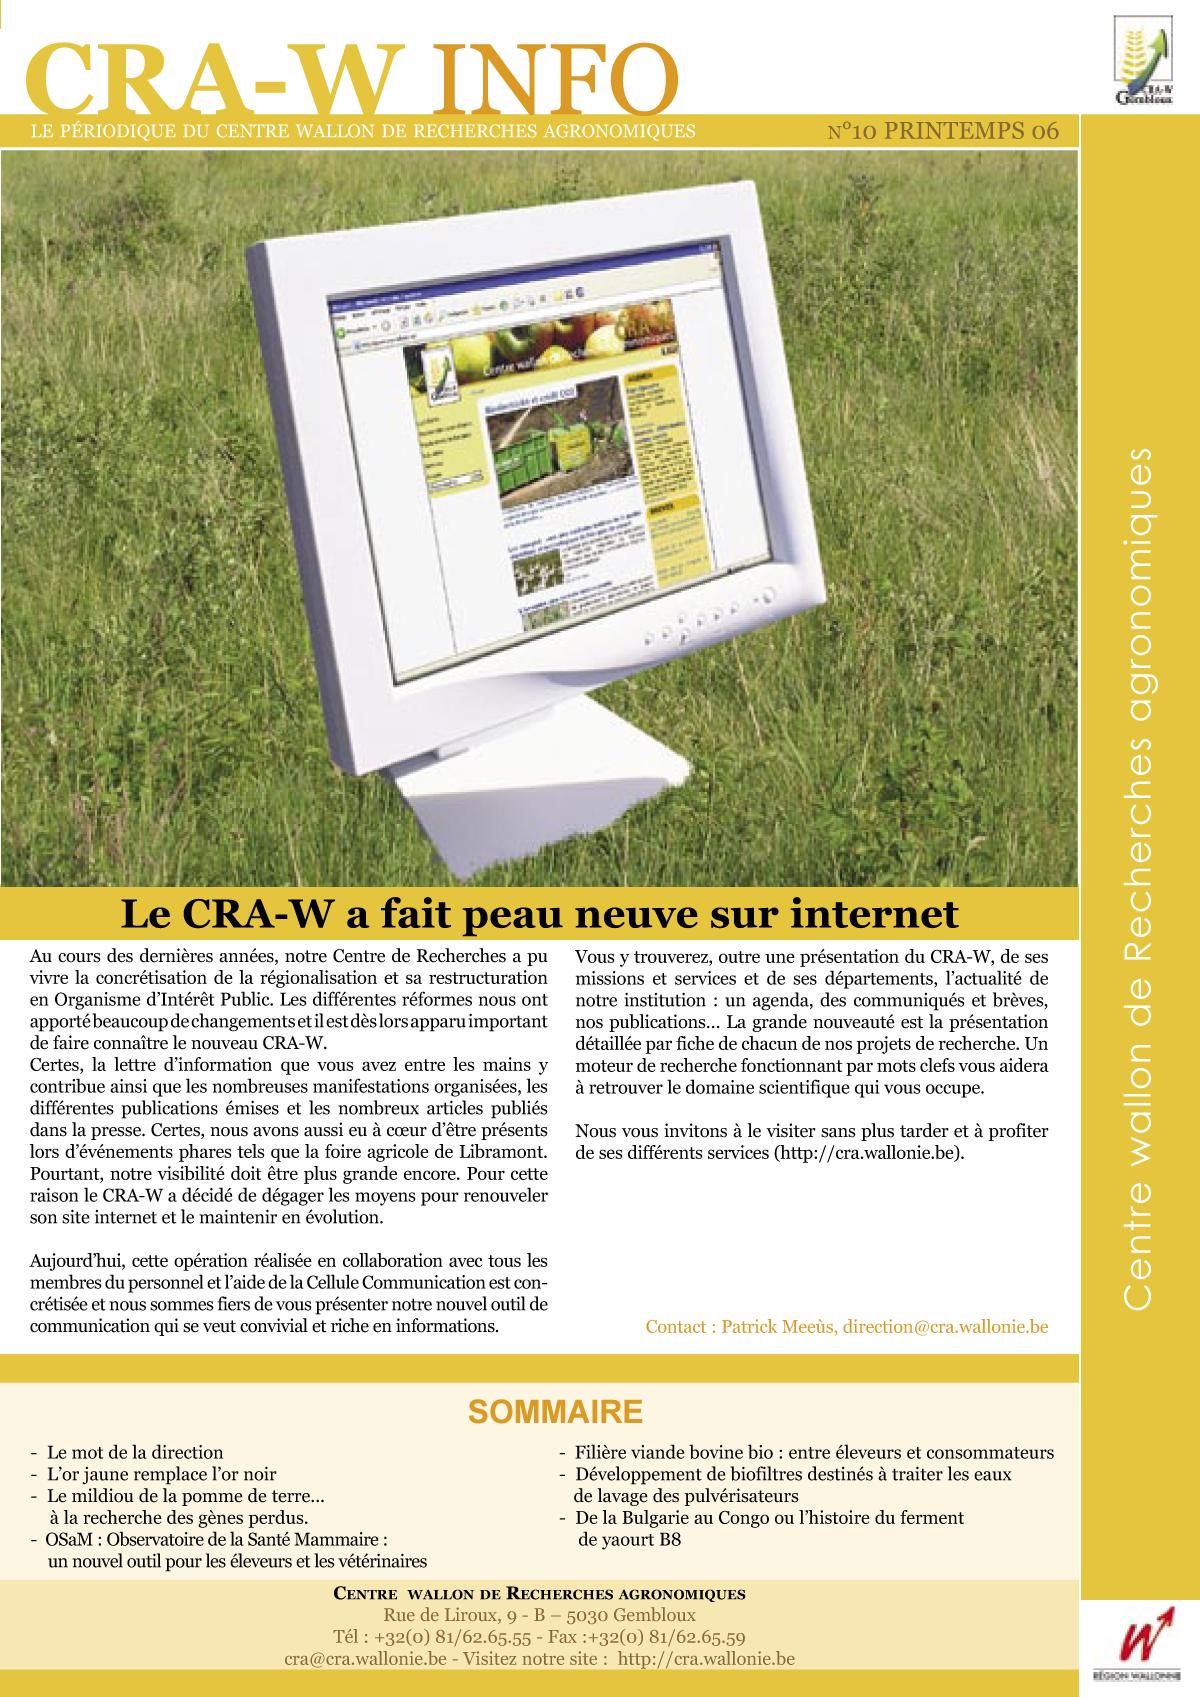 CRAW info n° 10